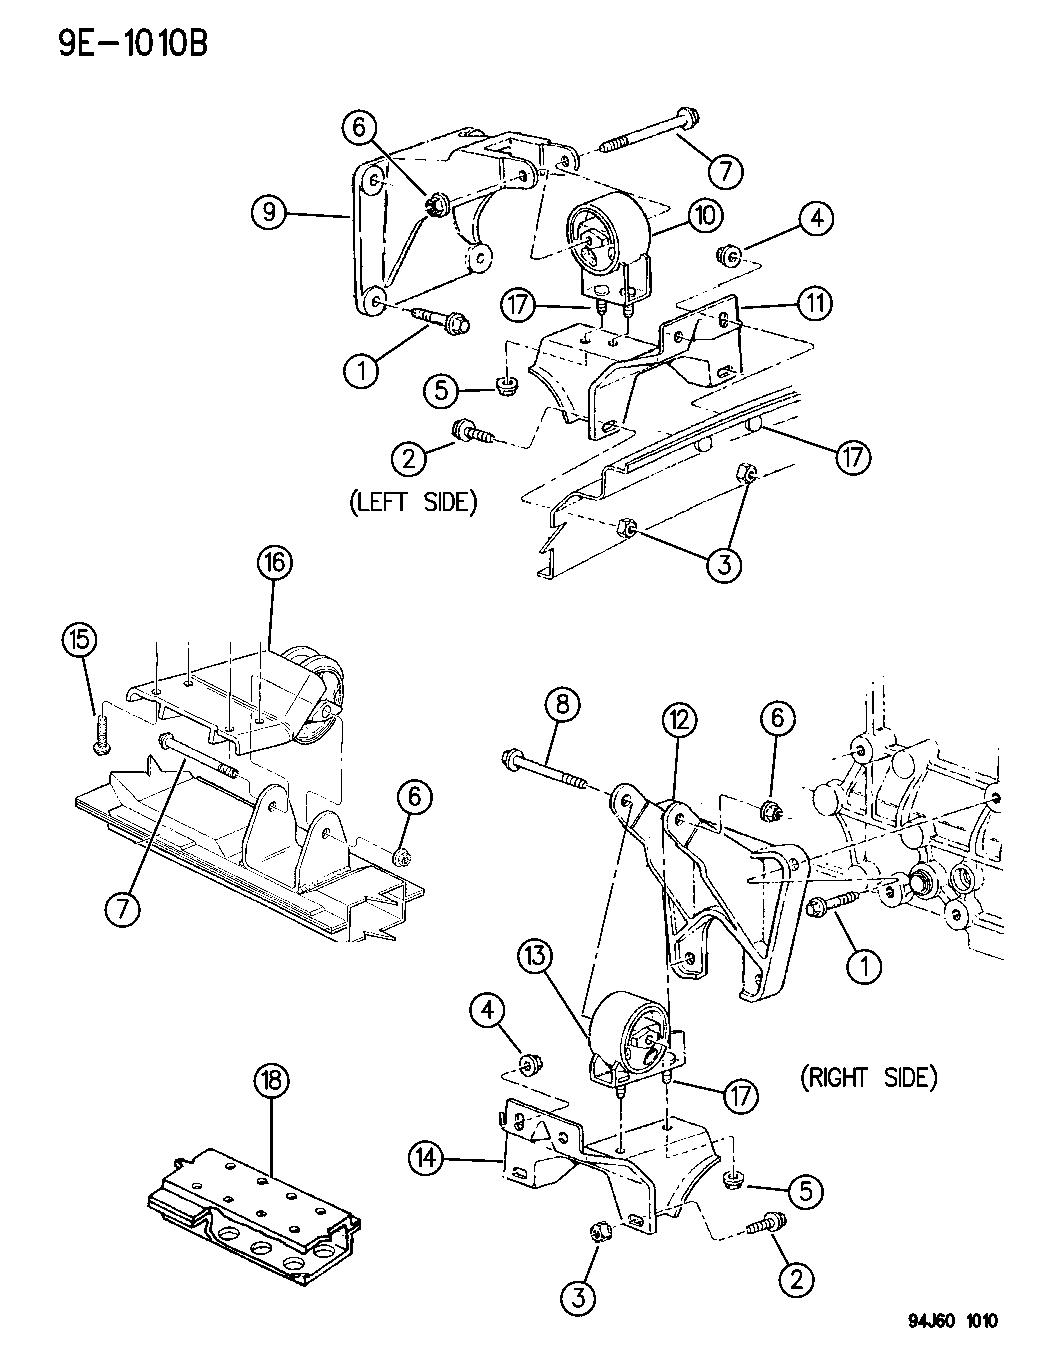 1996 jeep cherokee engine mounts